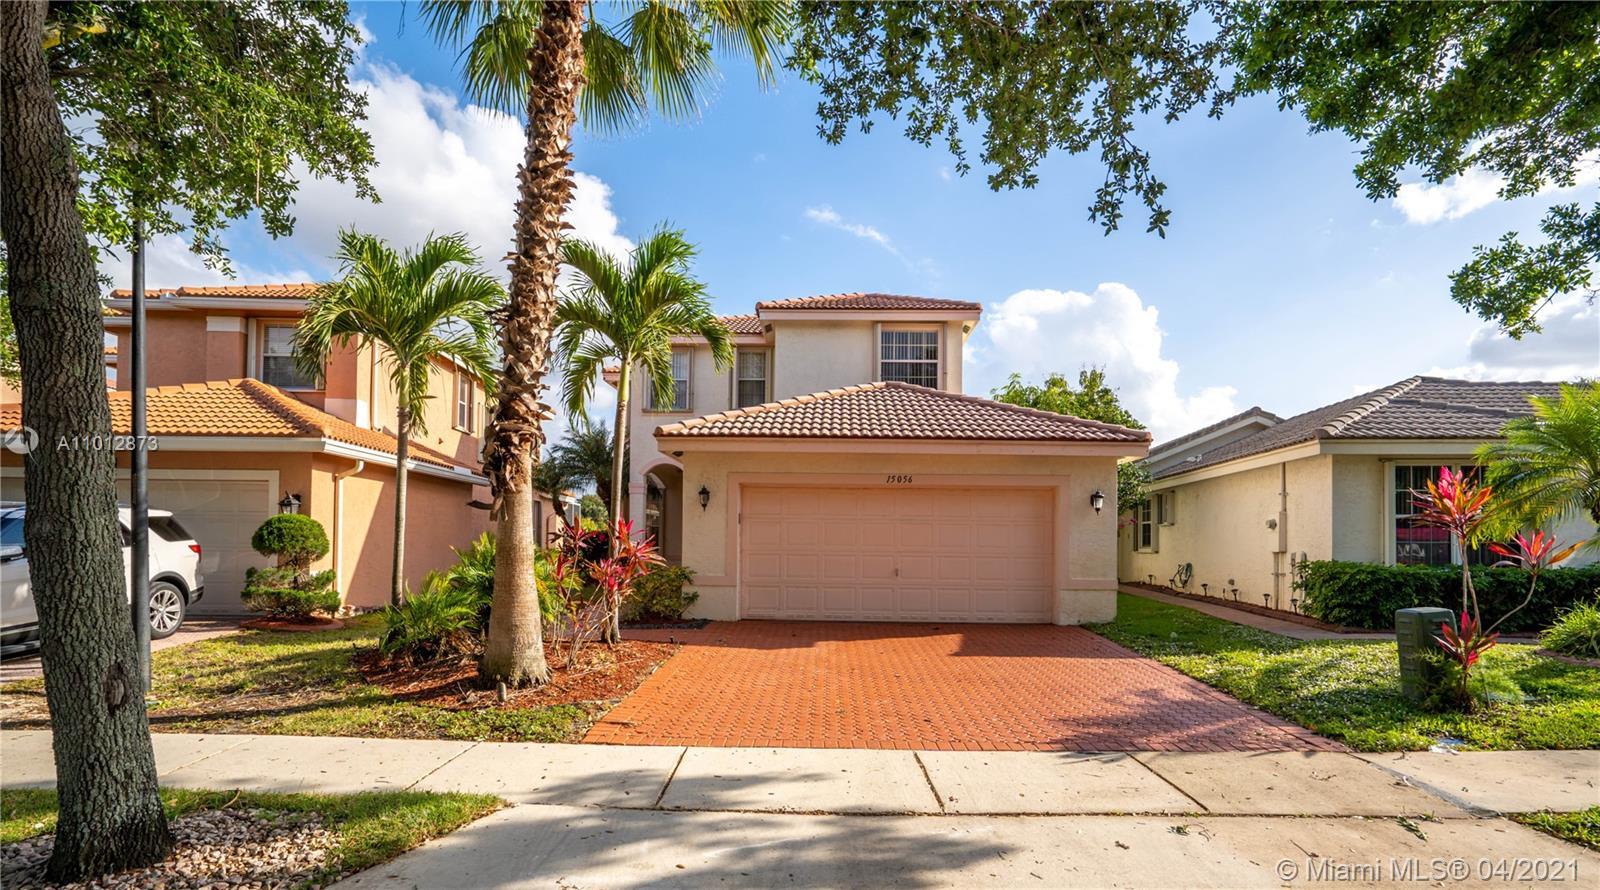 Silver Shores - 15056 SW 22nd St, Miramar, FL 33027